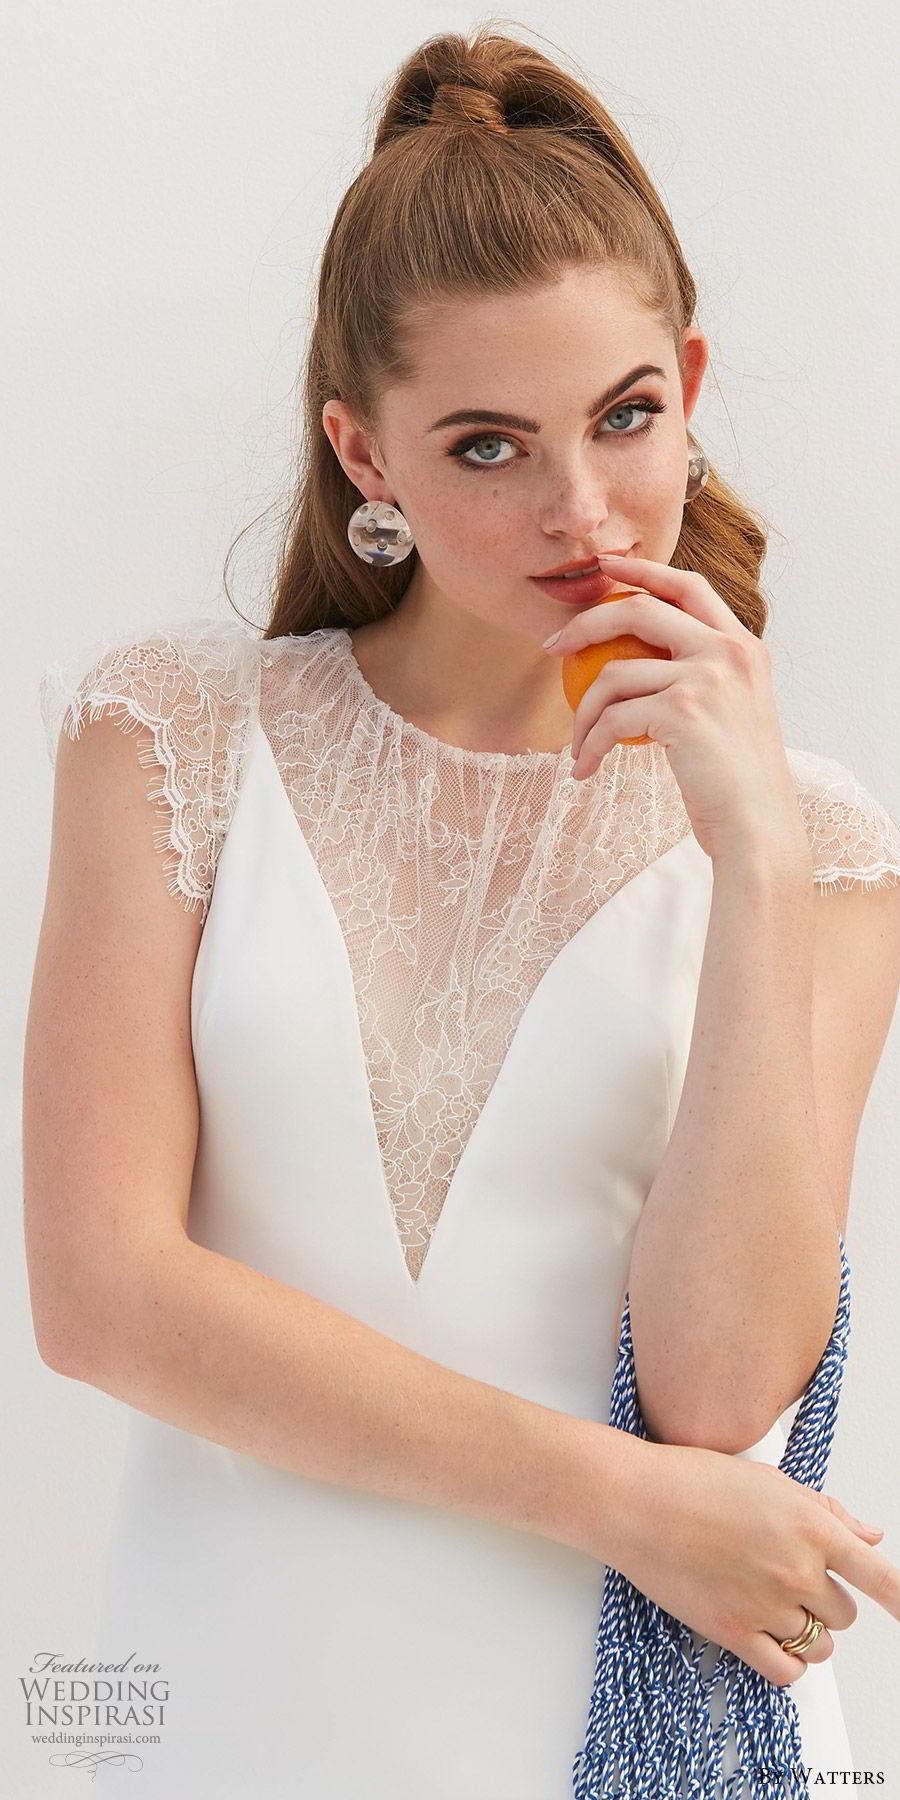 by watters 2020 bridal lace cap sleeves illusion jewel neck v neckline minimally embellished sheath wedding dress (11) illusion back elegant clean chic zv